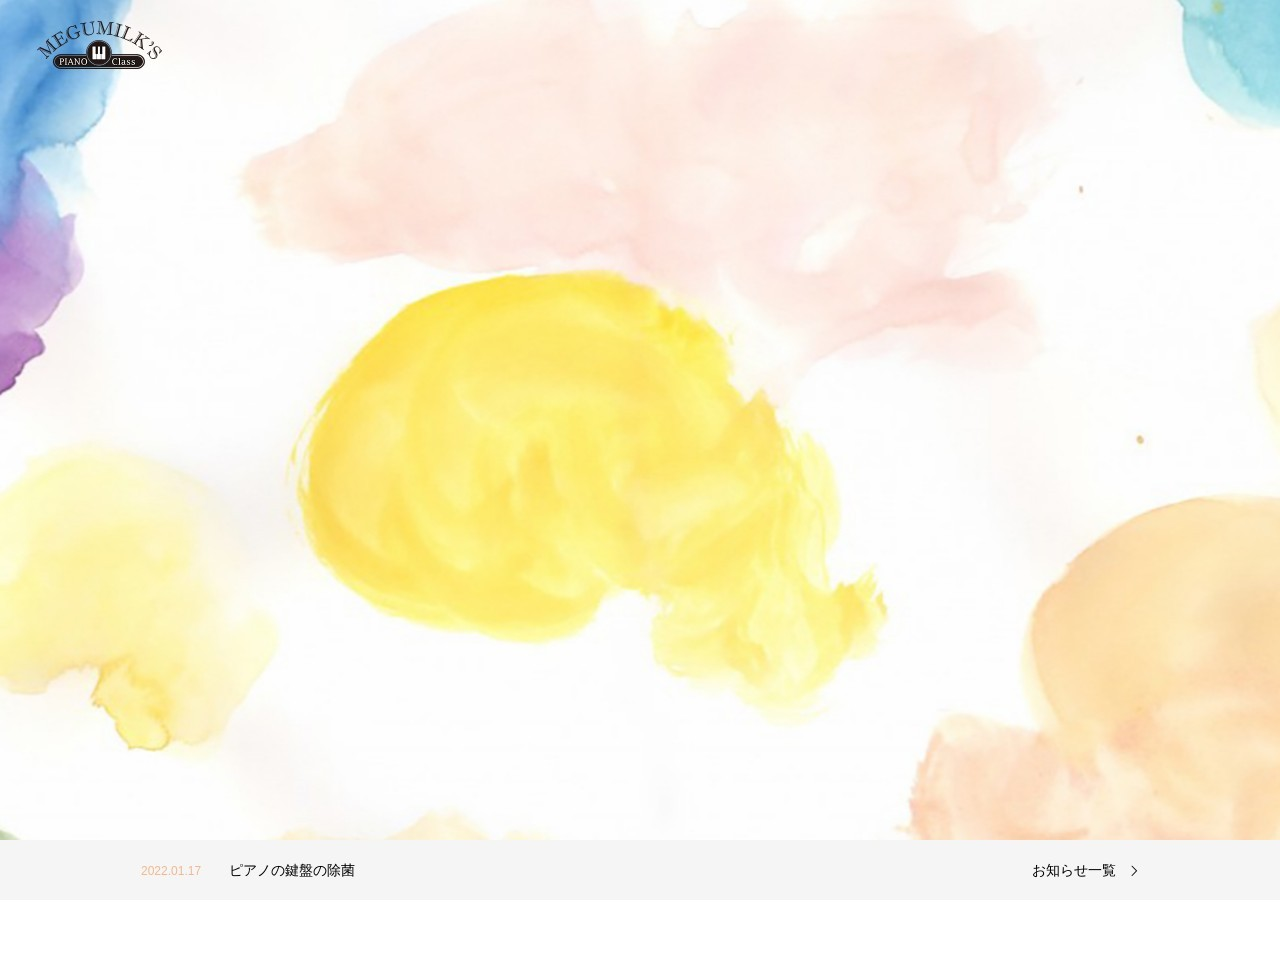 MEGUMILK's Piano Classのサムネイル